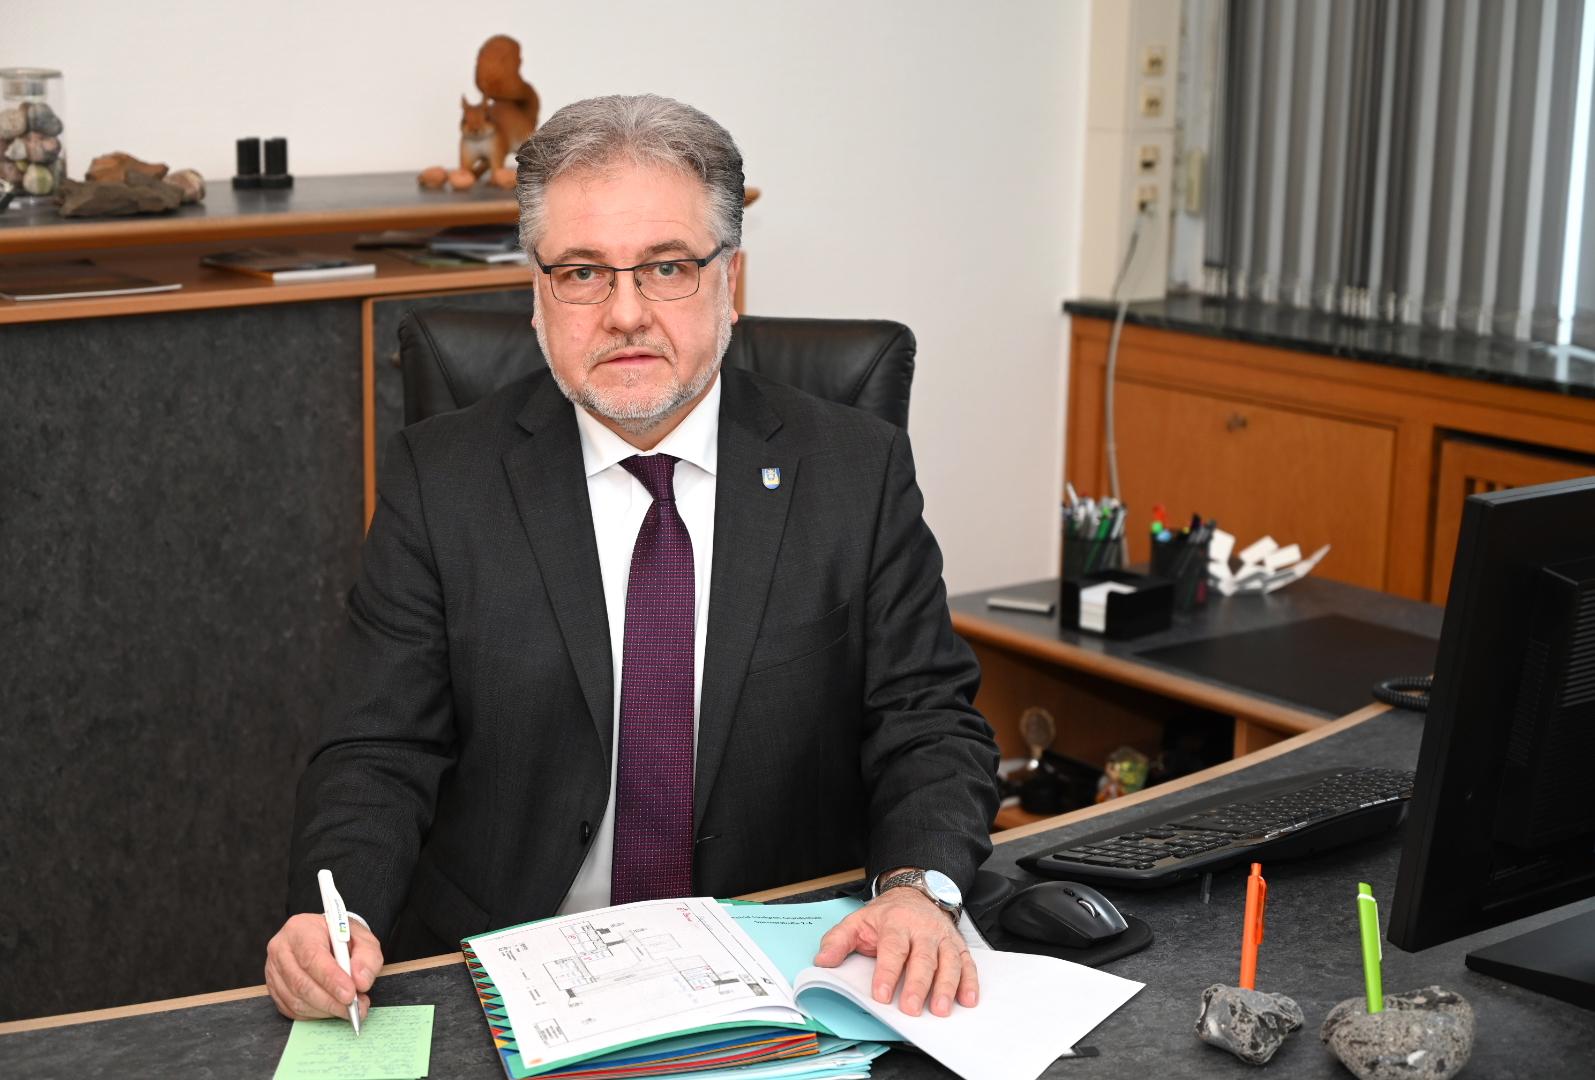 Bürgermeister Thomas Dinkelmann